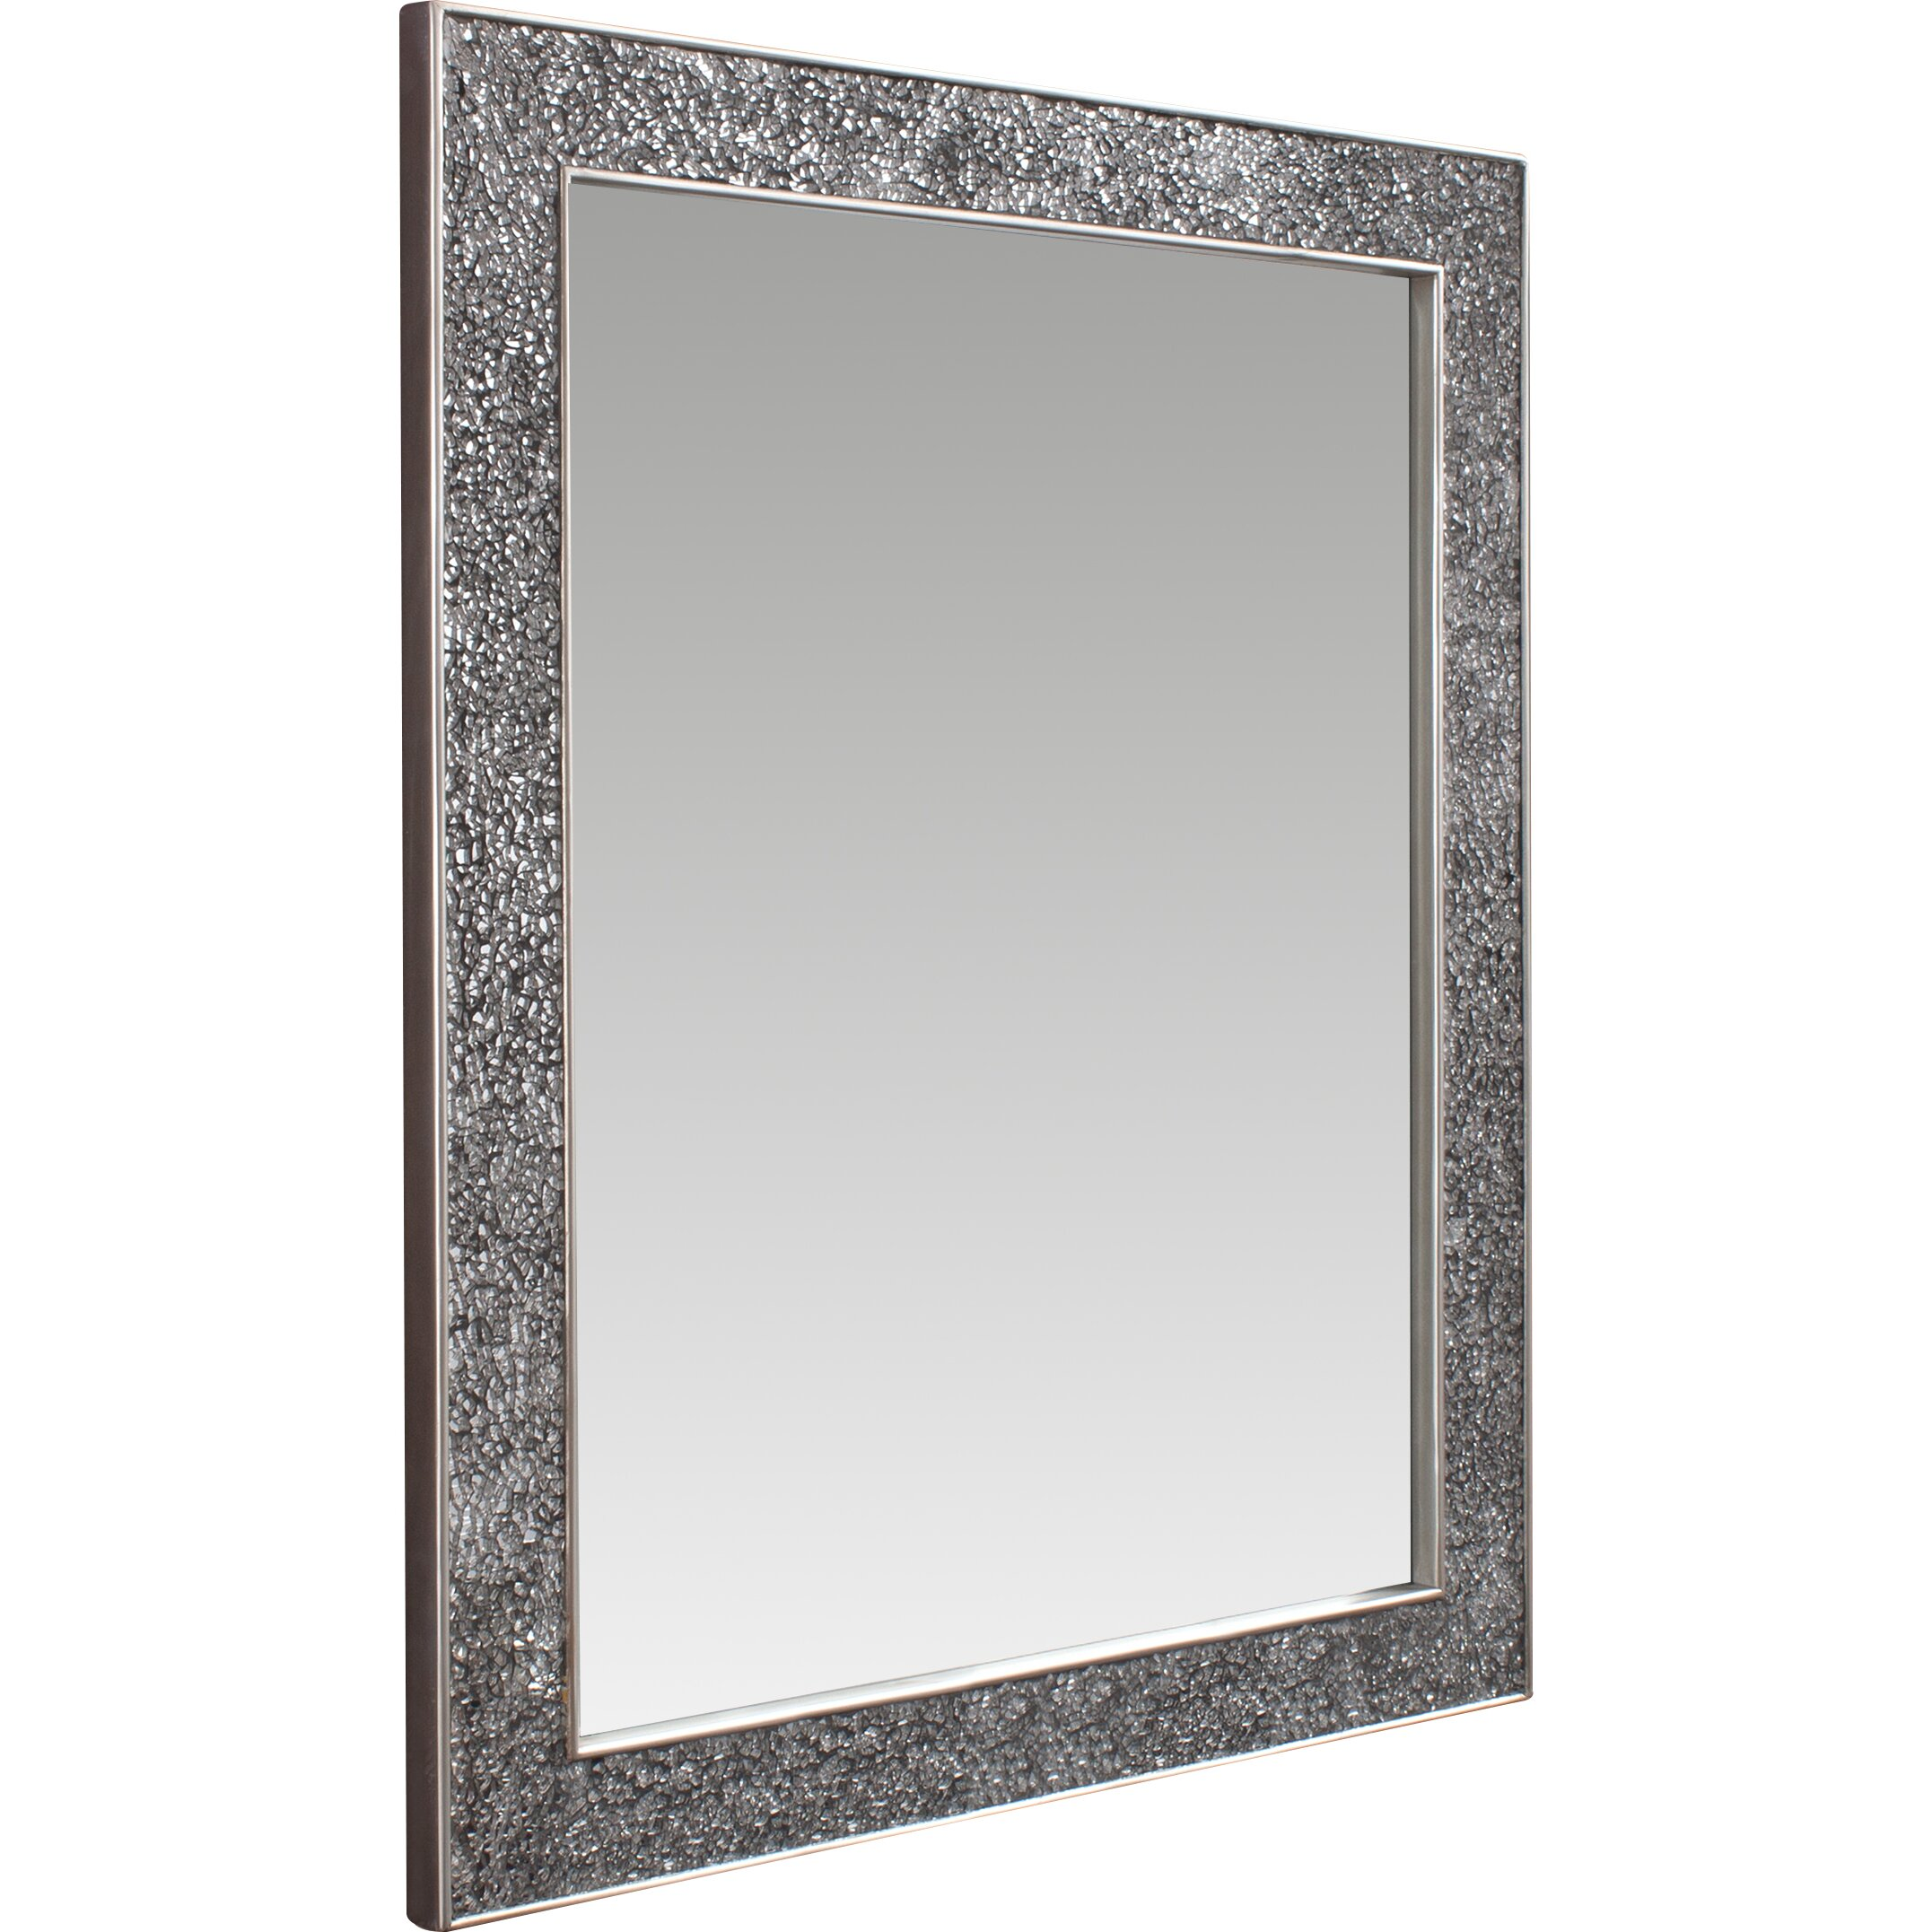 Gallery ritz wall mirror reviews wayfair uk for Mirror gallery wall